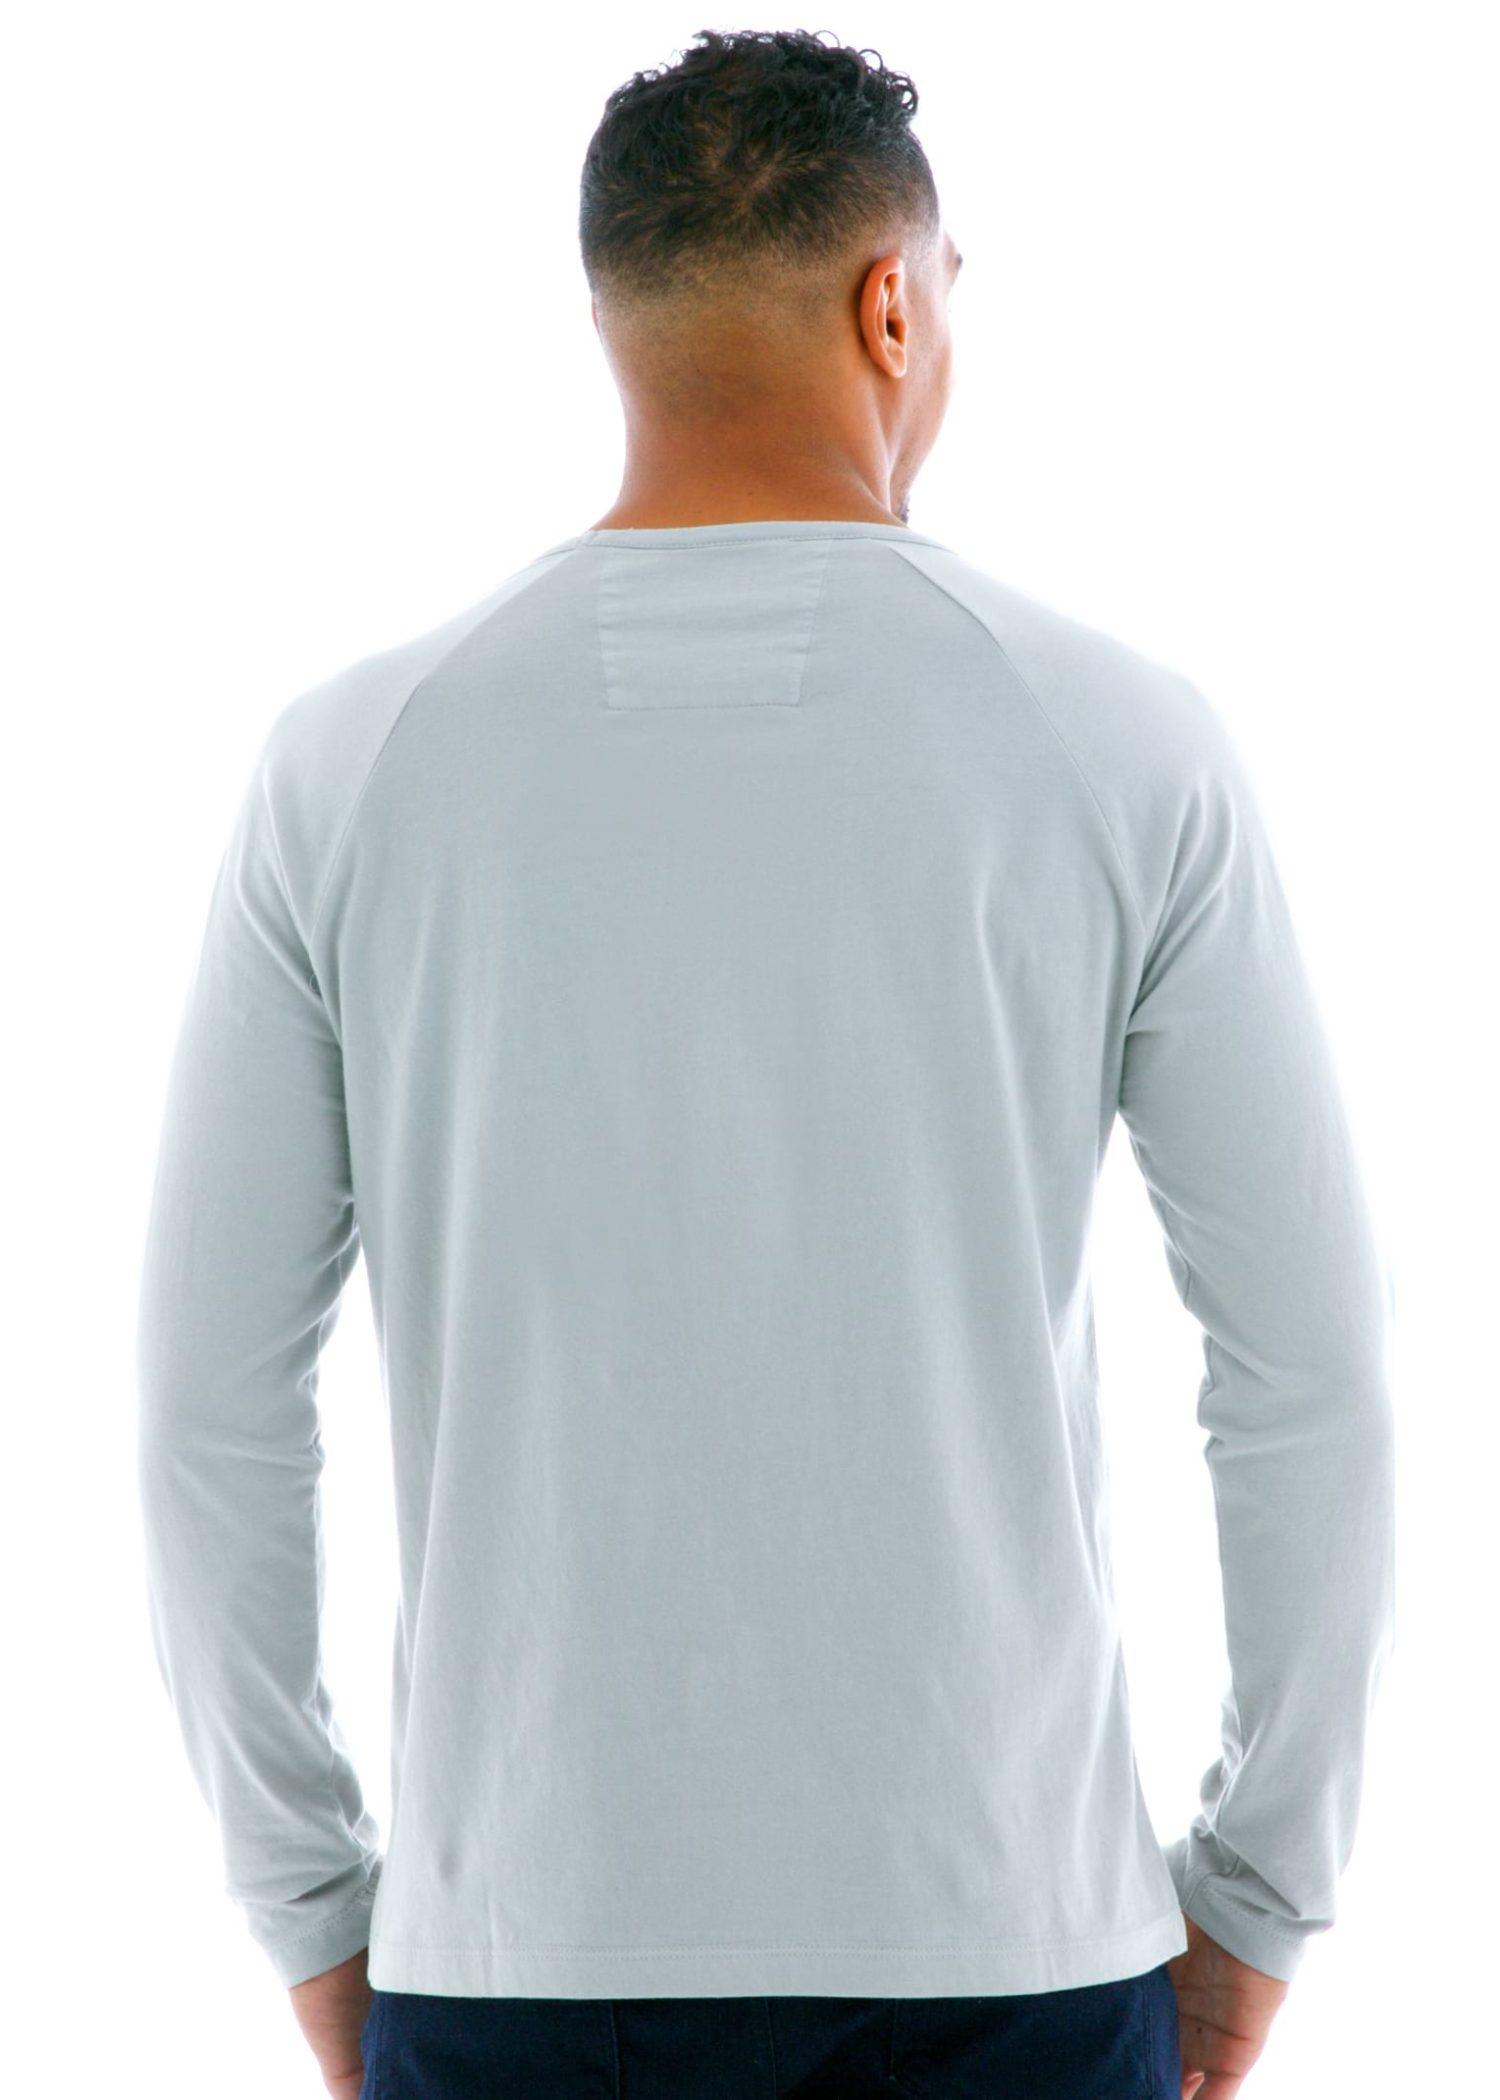 Long Sleeve Raglan Crew T-Shirt Back View